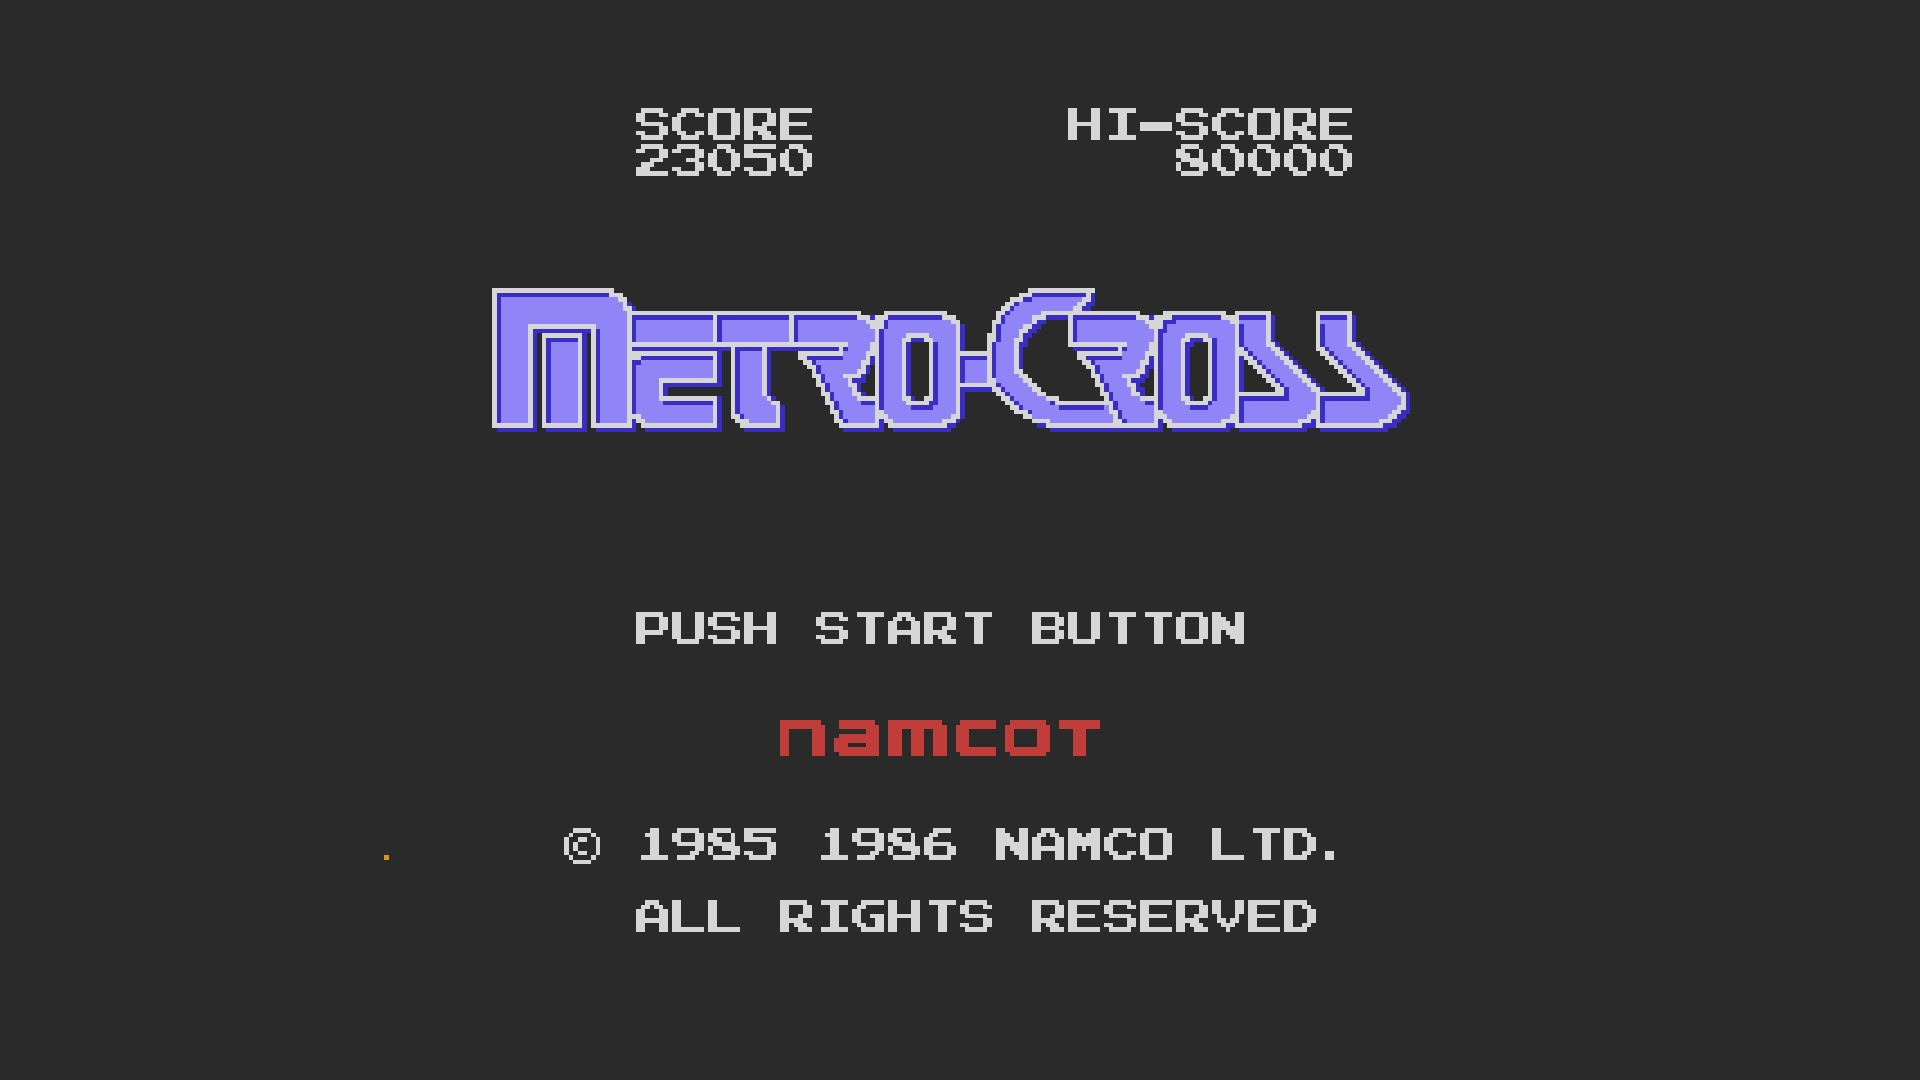 AkinNahtanoj: Metro-Cross (NES/Famicom Emulated) 23,050 points on 2020-09-08 03:51:26